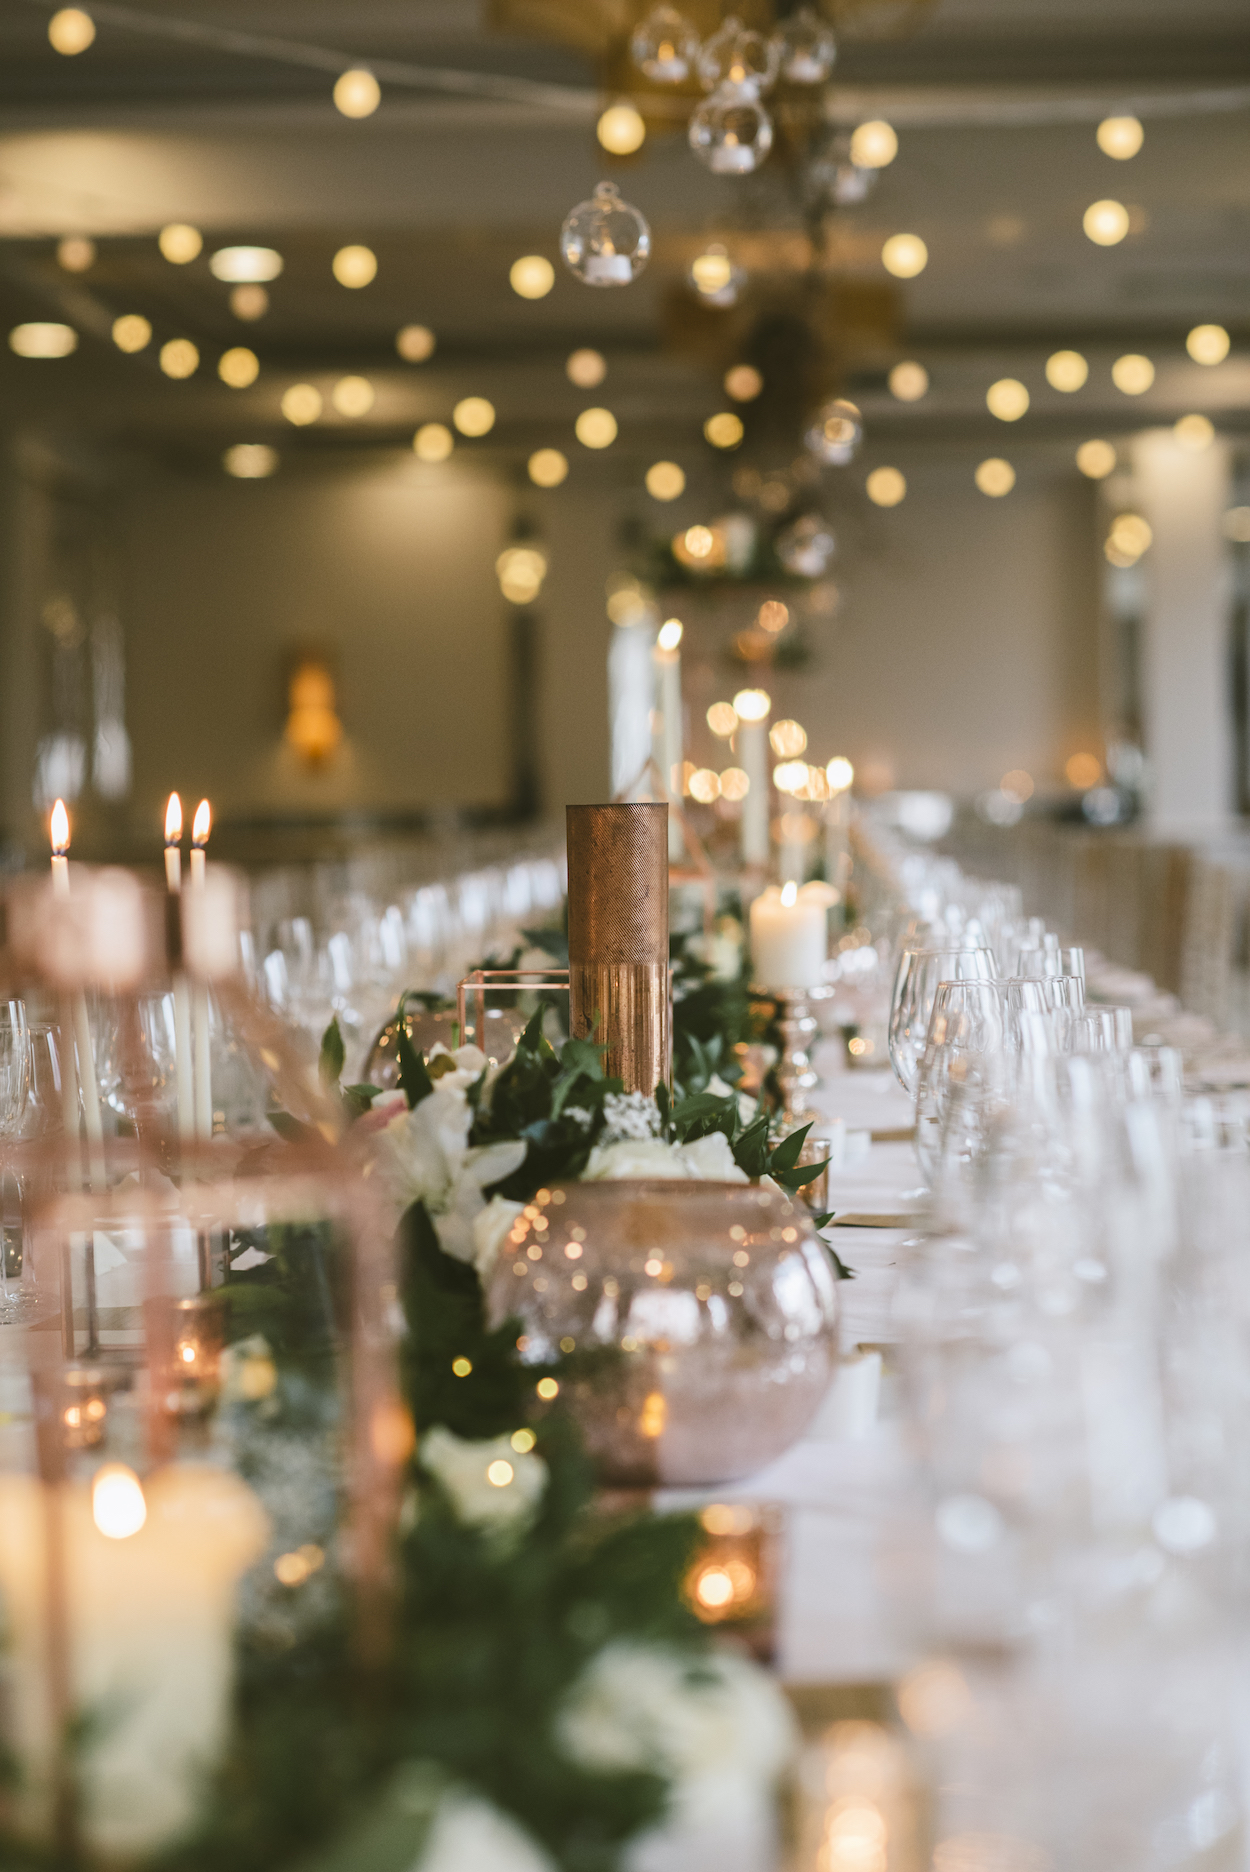 Francis_meaney_photography_merchant_hotel_wedding_belfast_inspire_weddings_10.jpeg